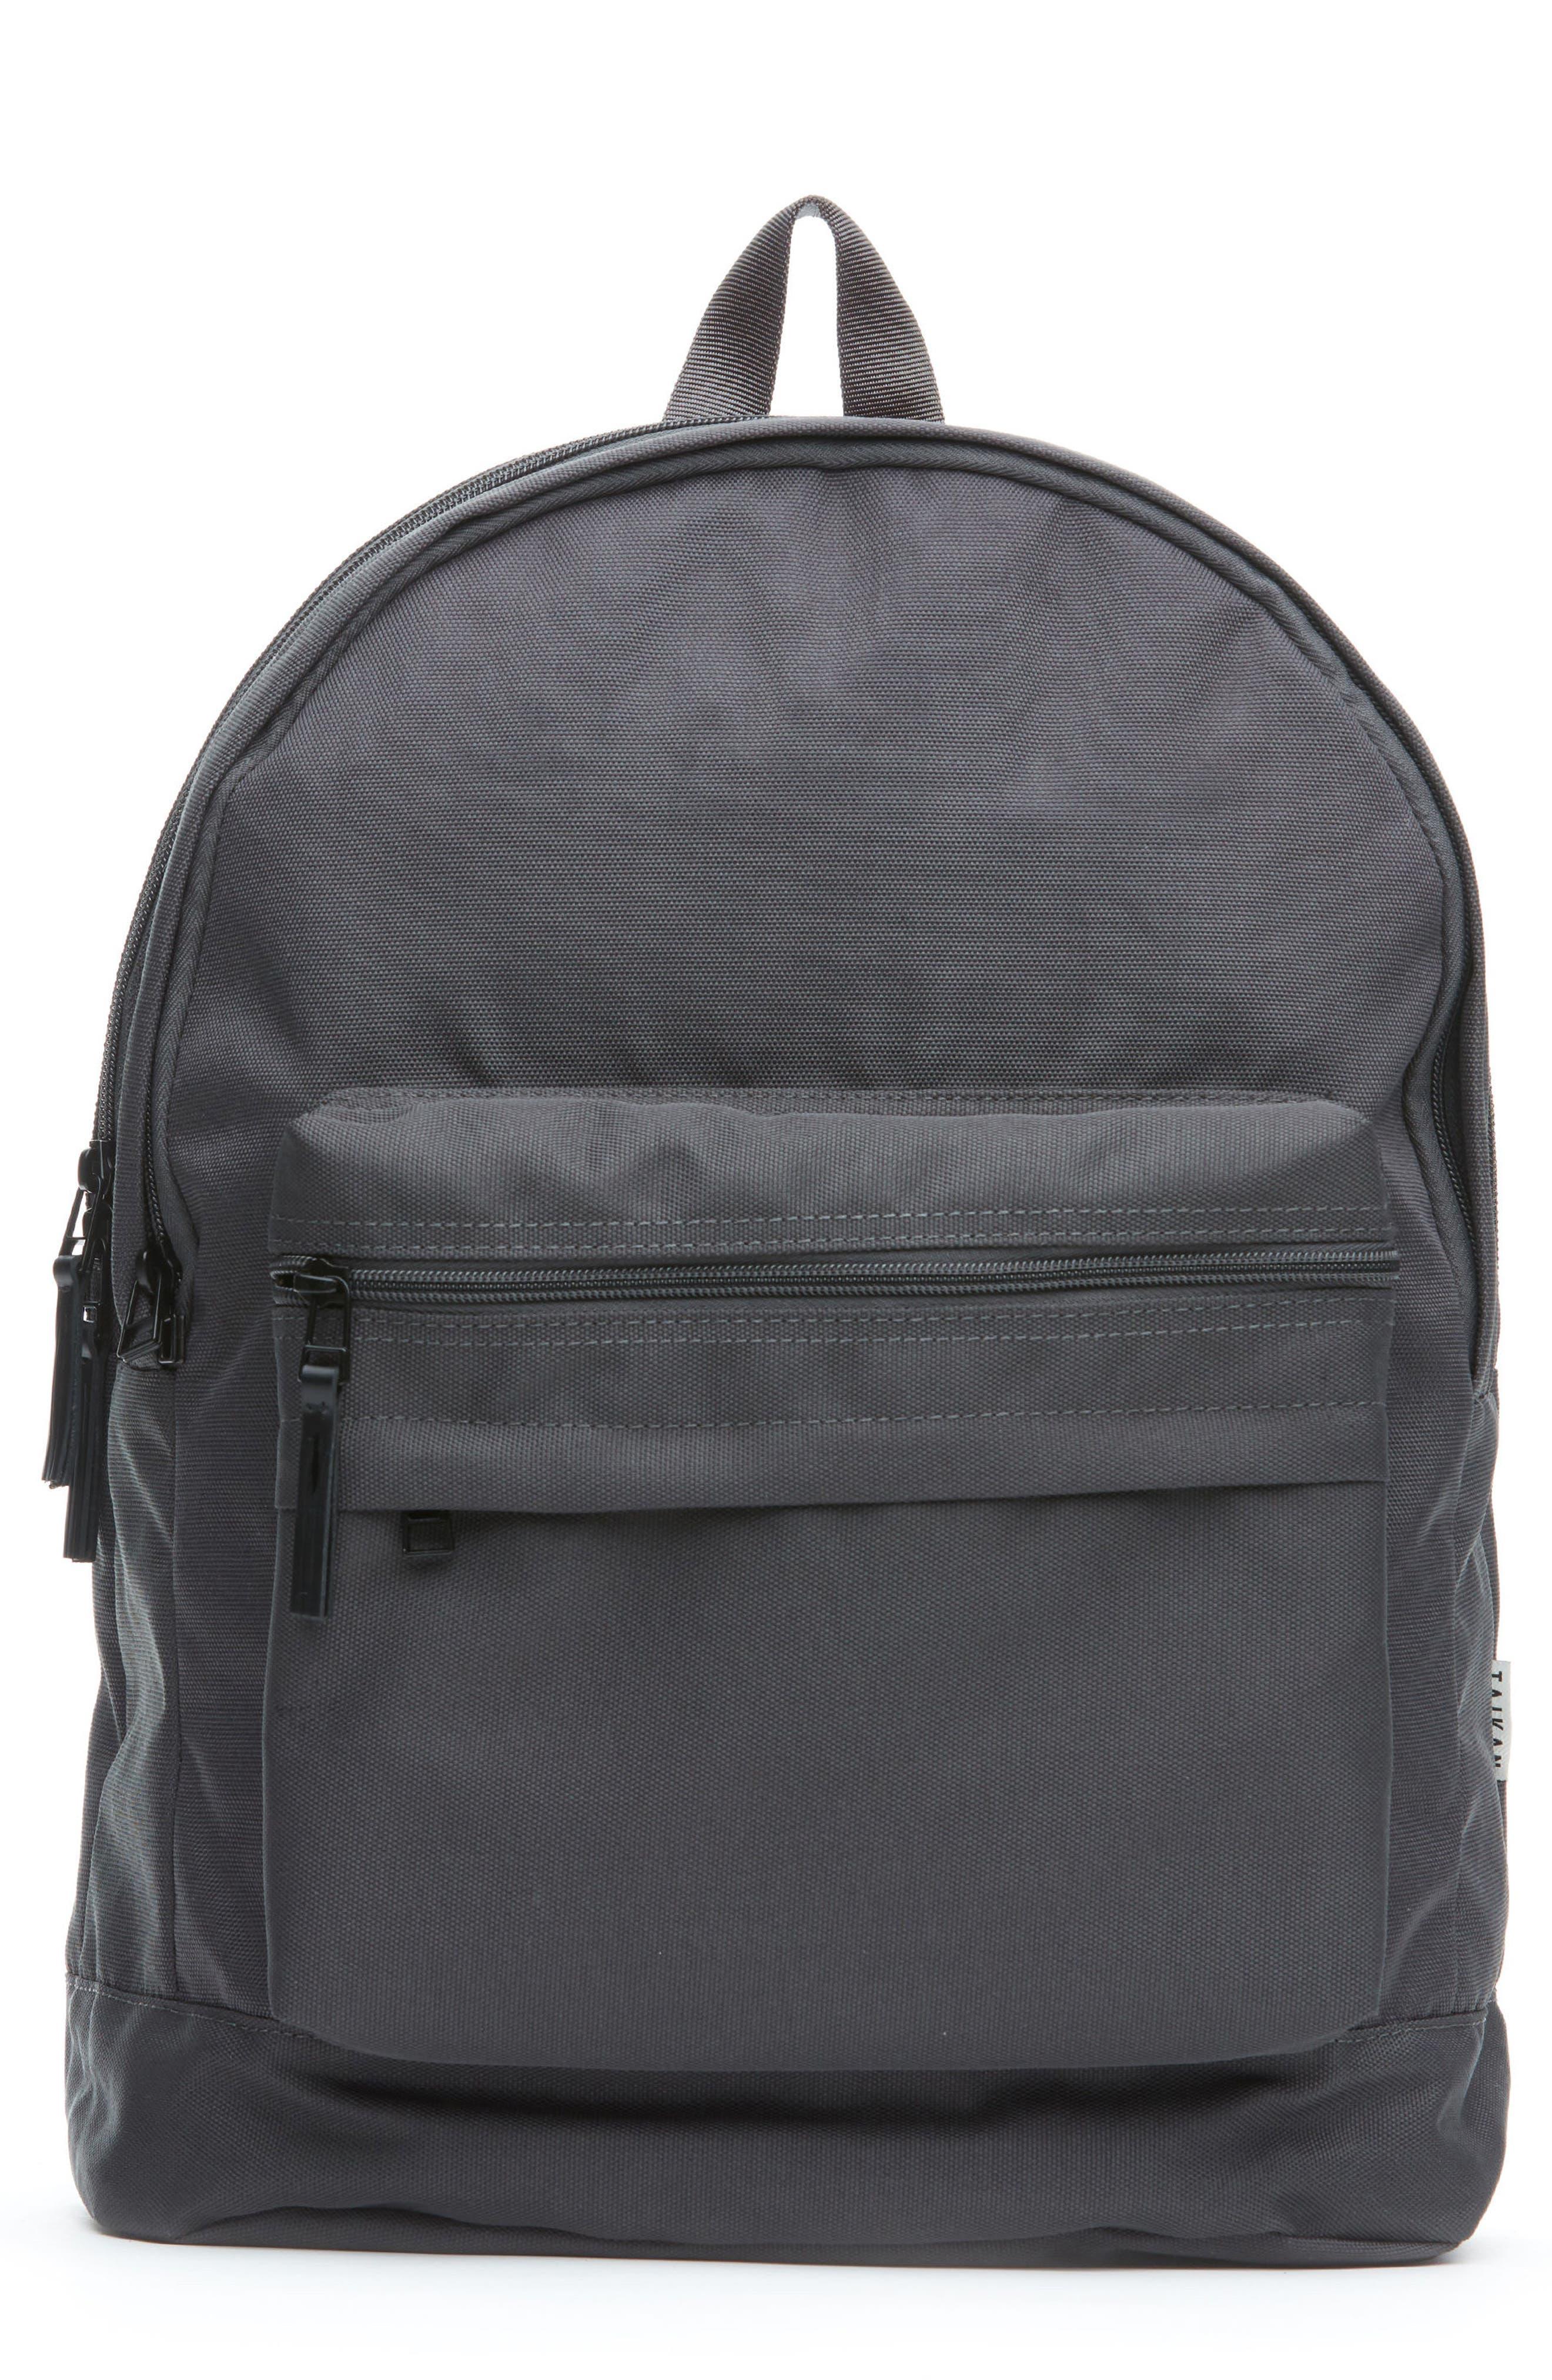 Lancer Backpack,                             Main thumbnail 1, color,                             Charcoal